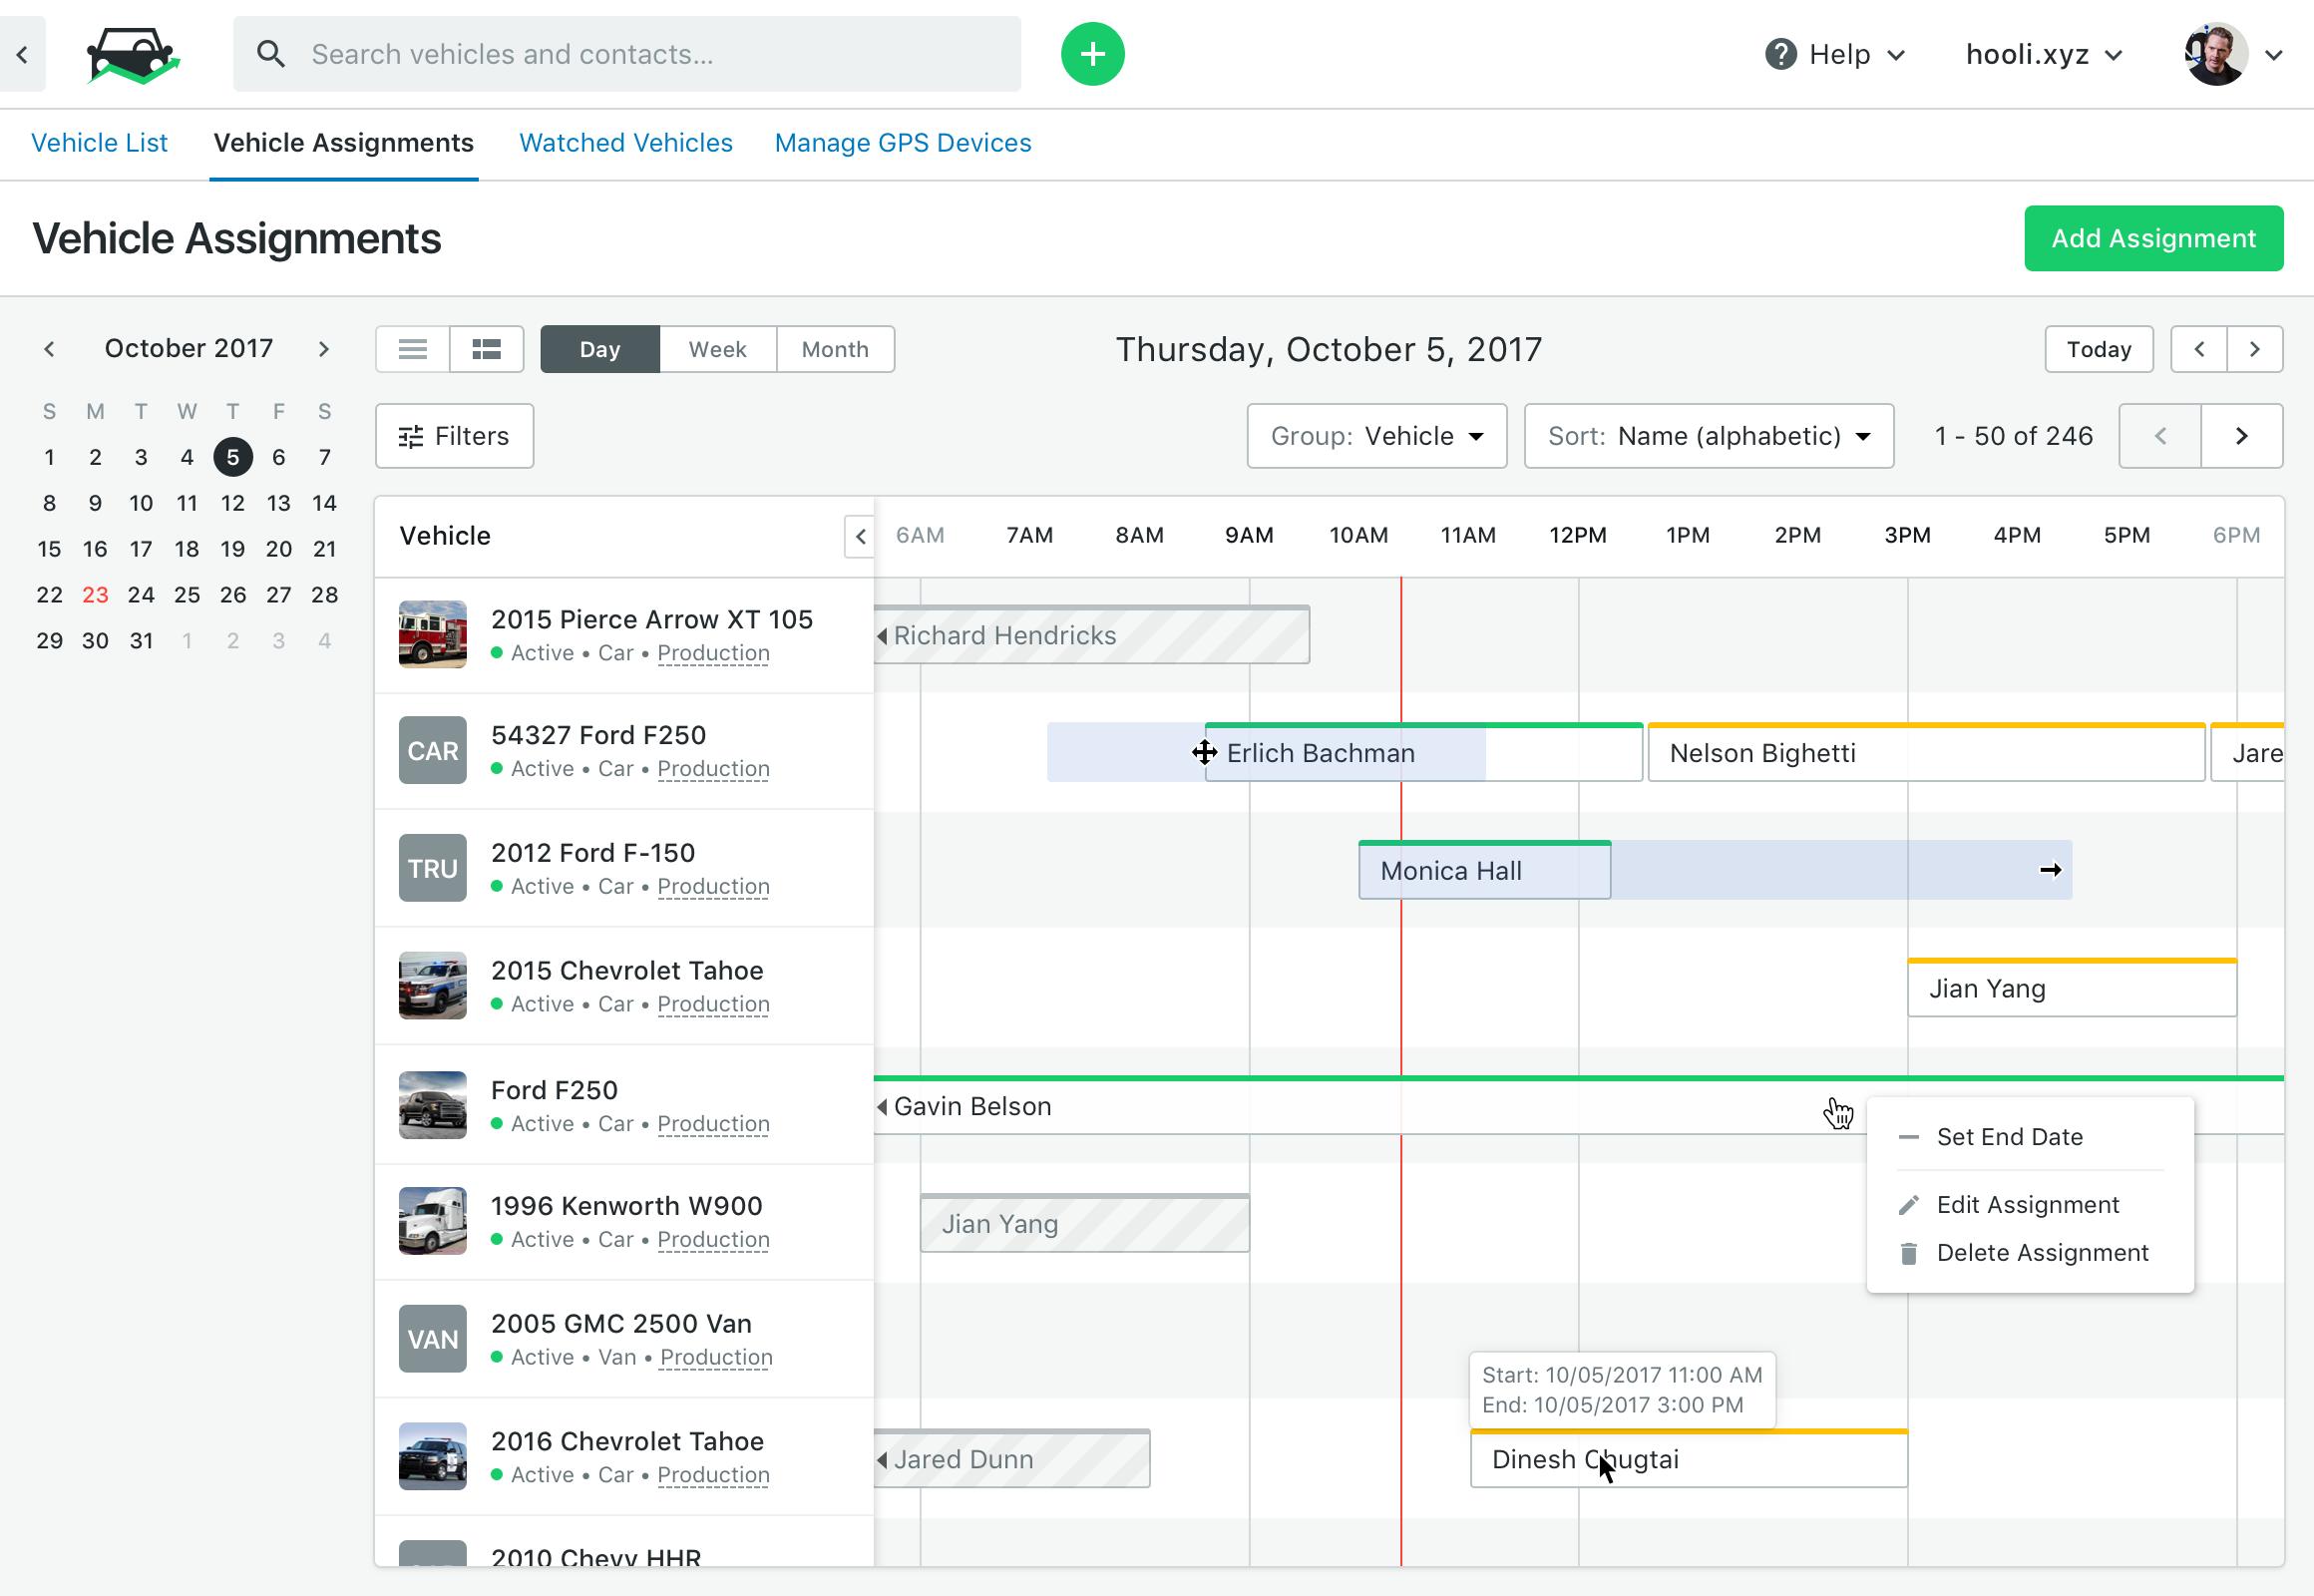 fleet-vehicle-assignment-scheduler